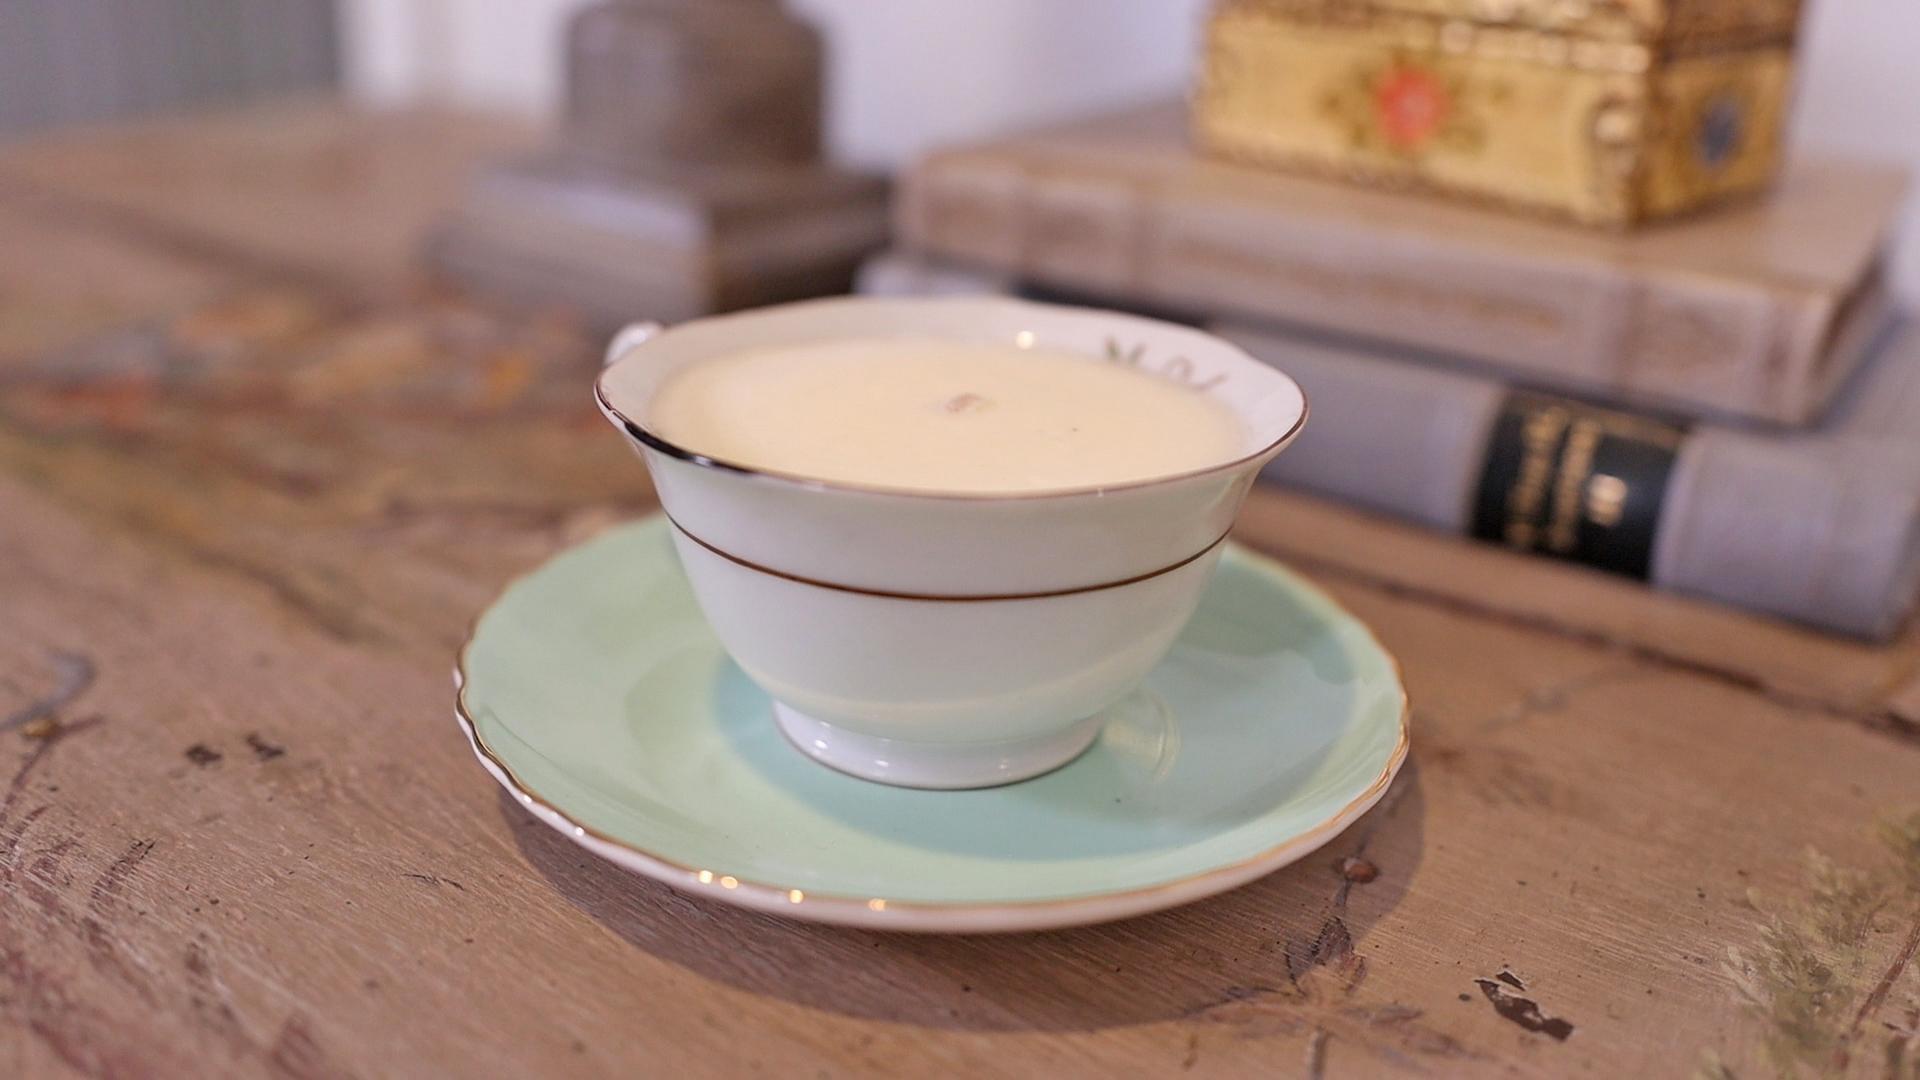 Artisan made teacup candle on a blue saucer.